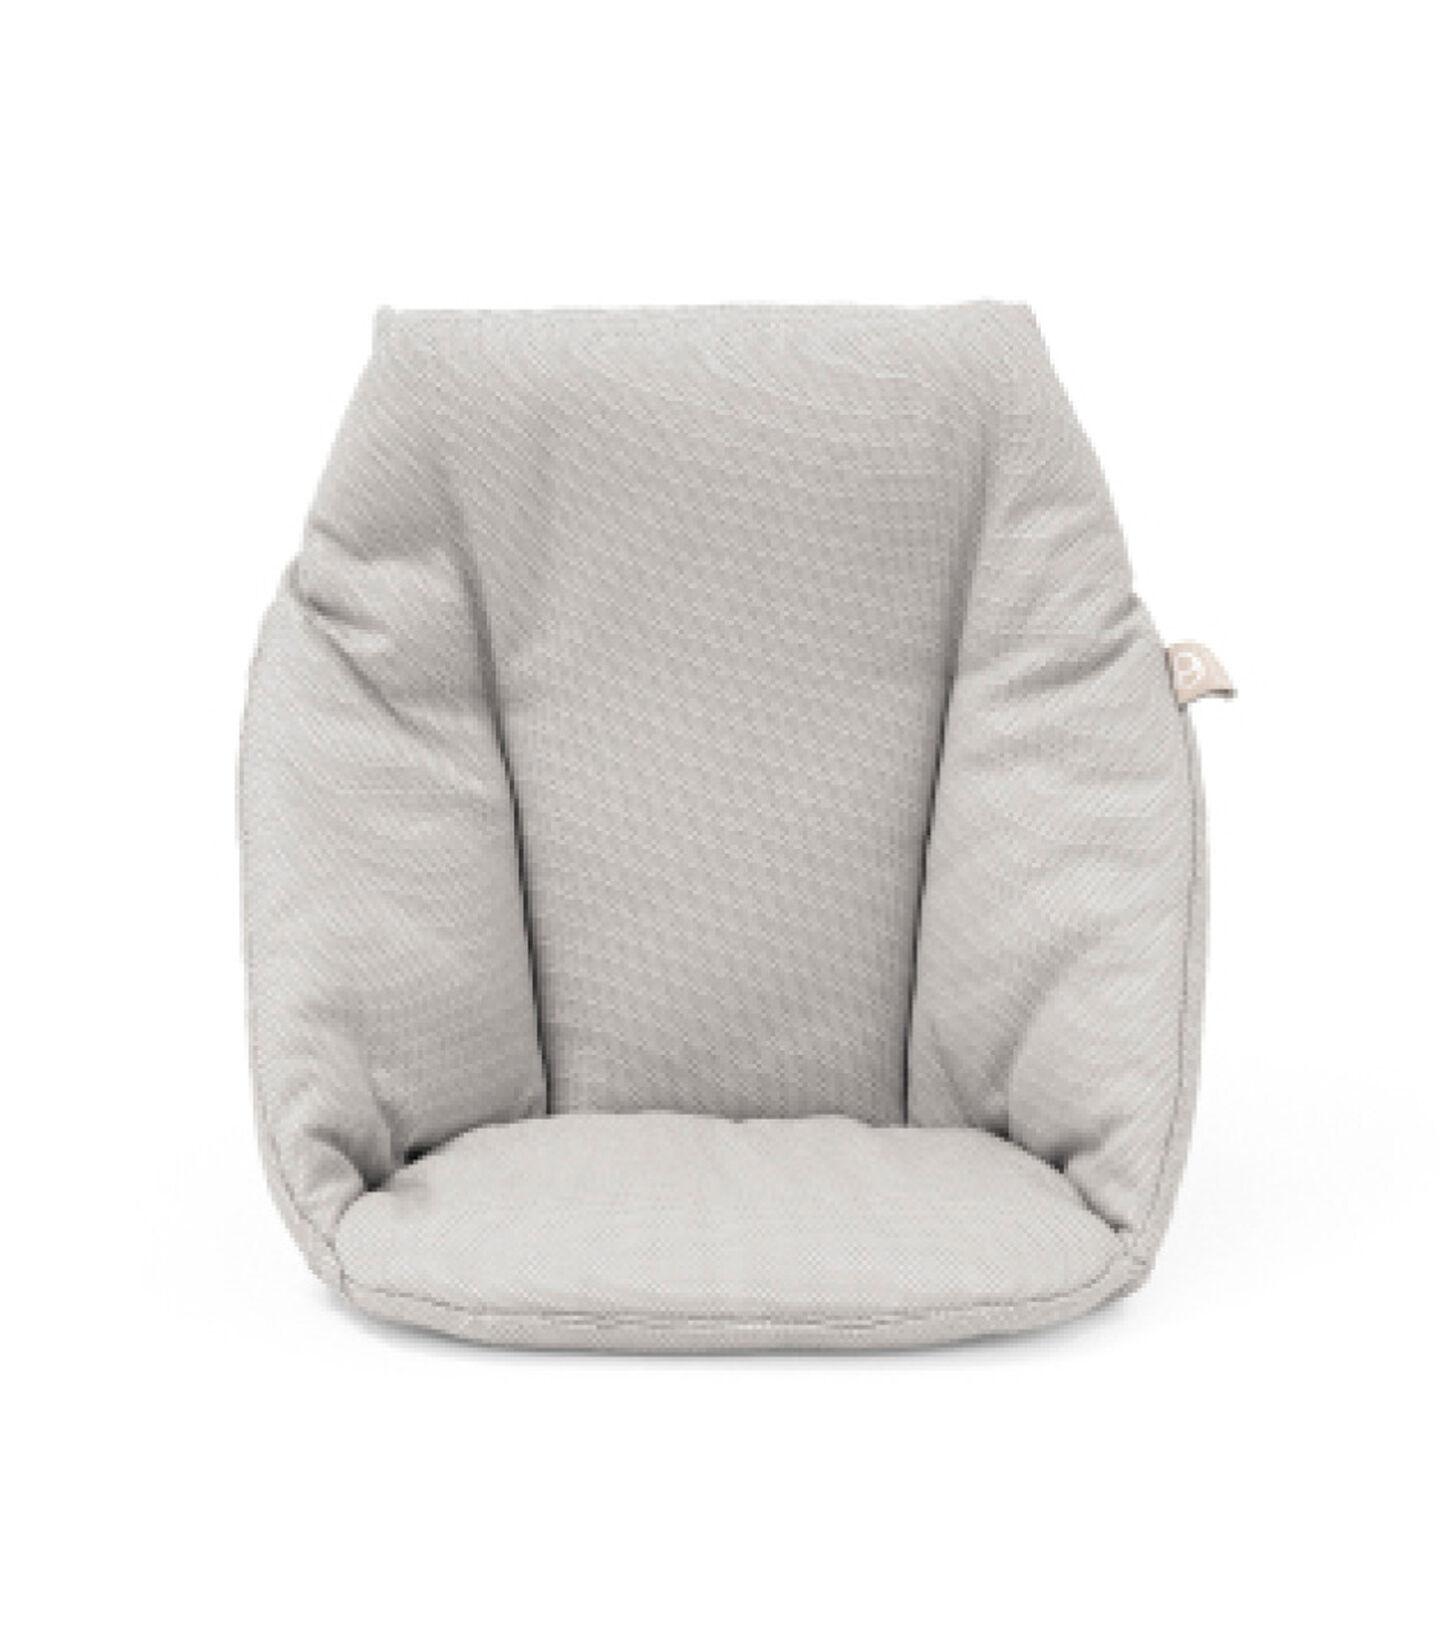 Tripp Trapp® Baby Cushion Timeless Grey OCS, Gris intemporel, mainview view 1